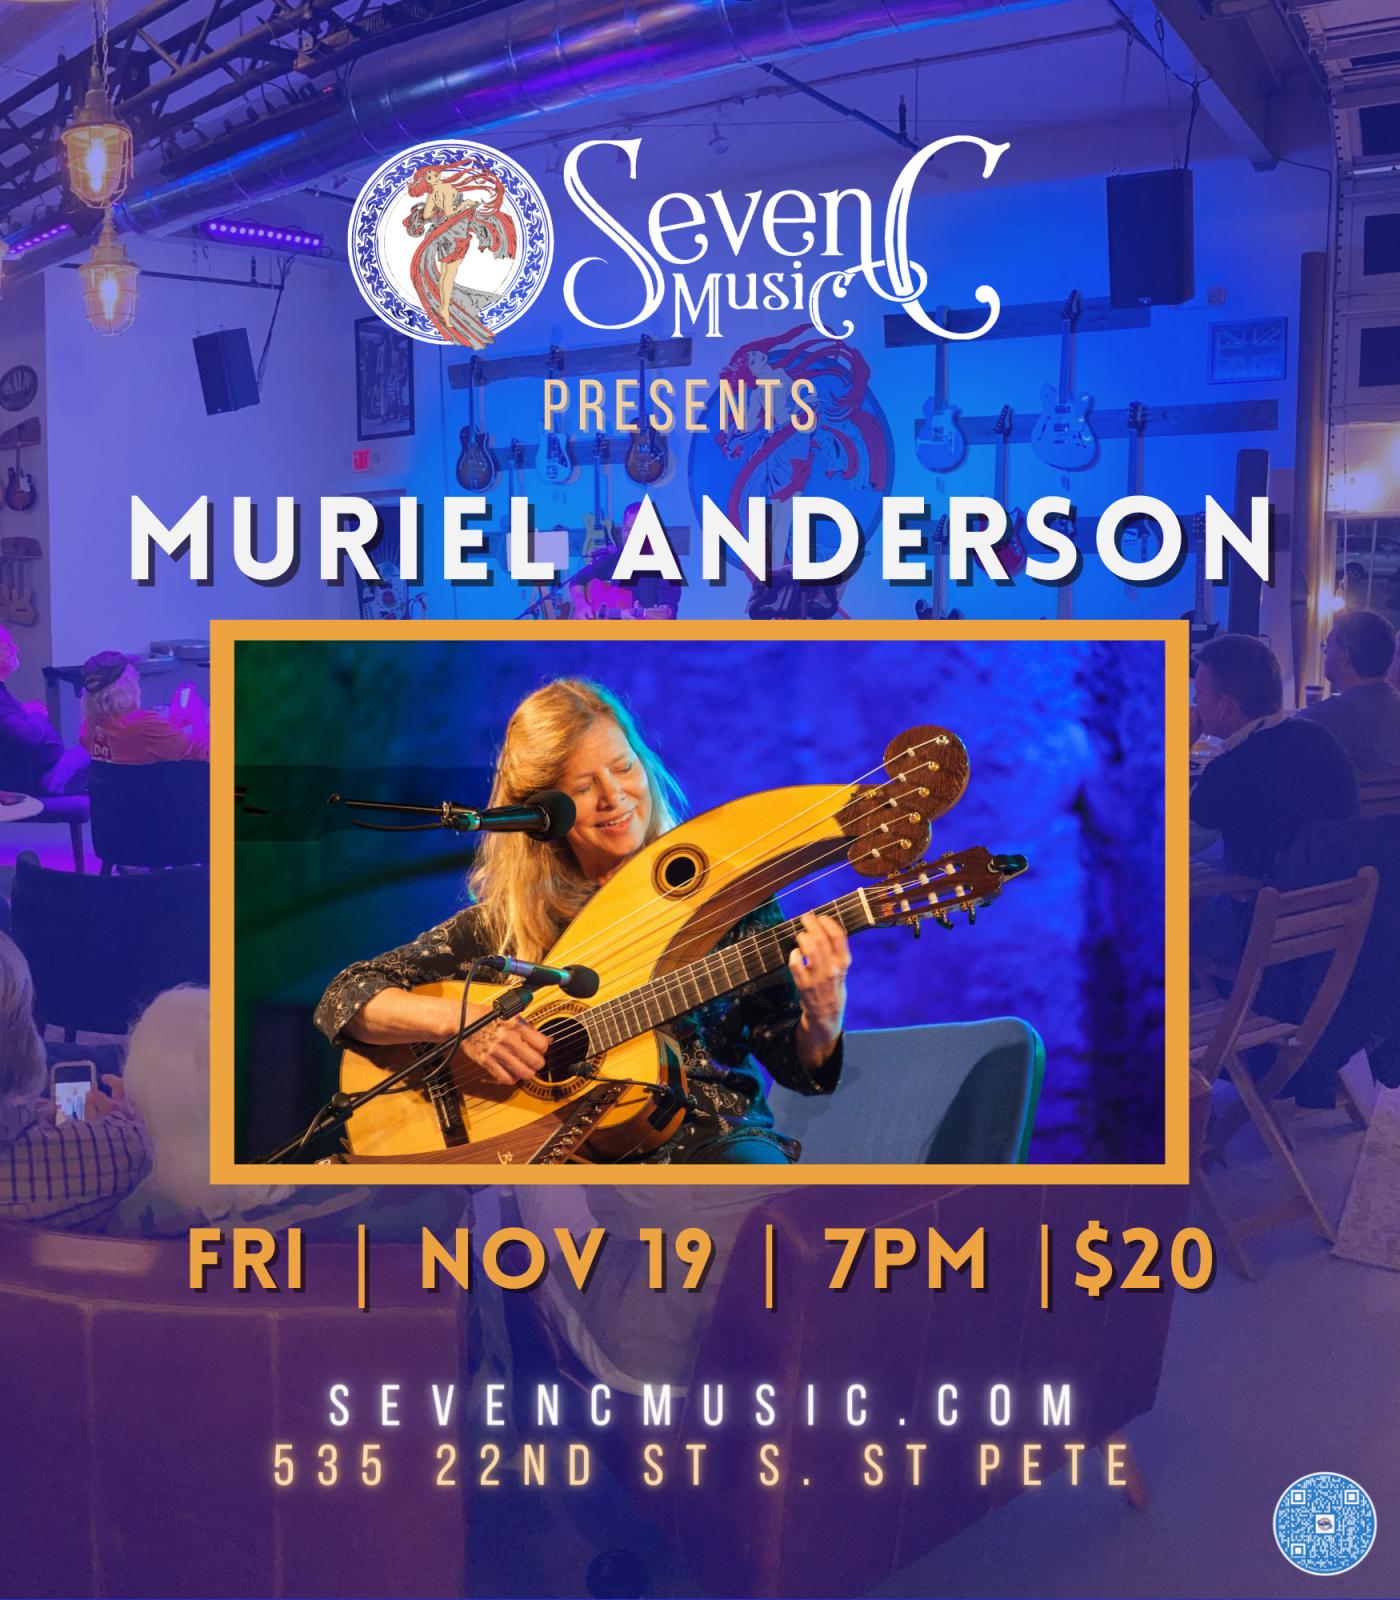 Muriel Anderson Live In Concert